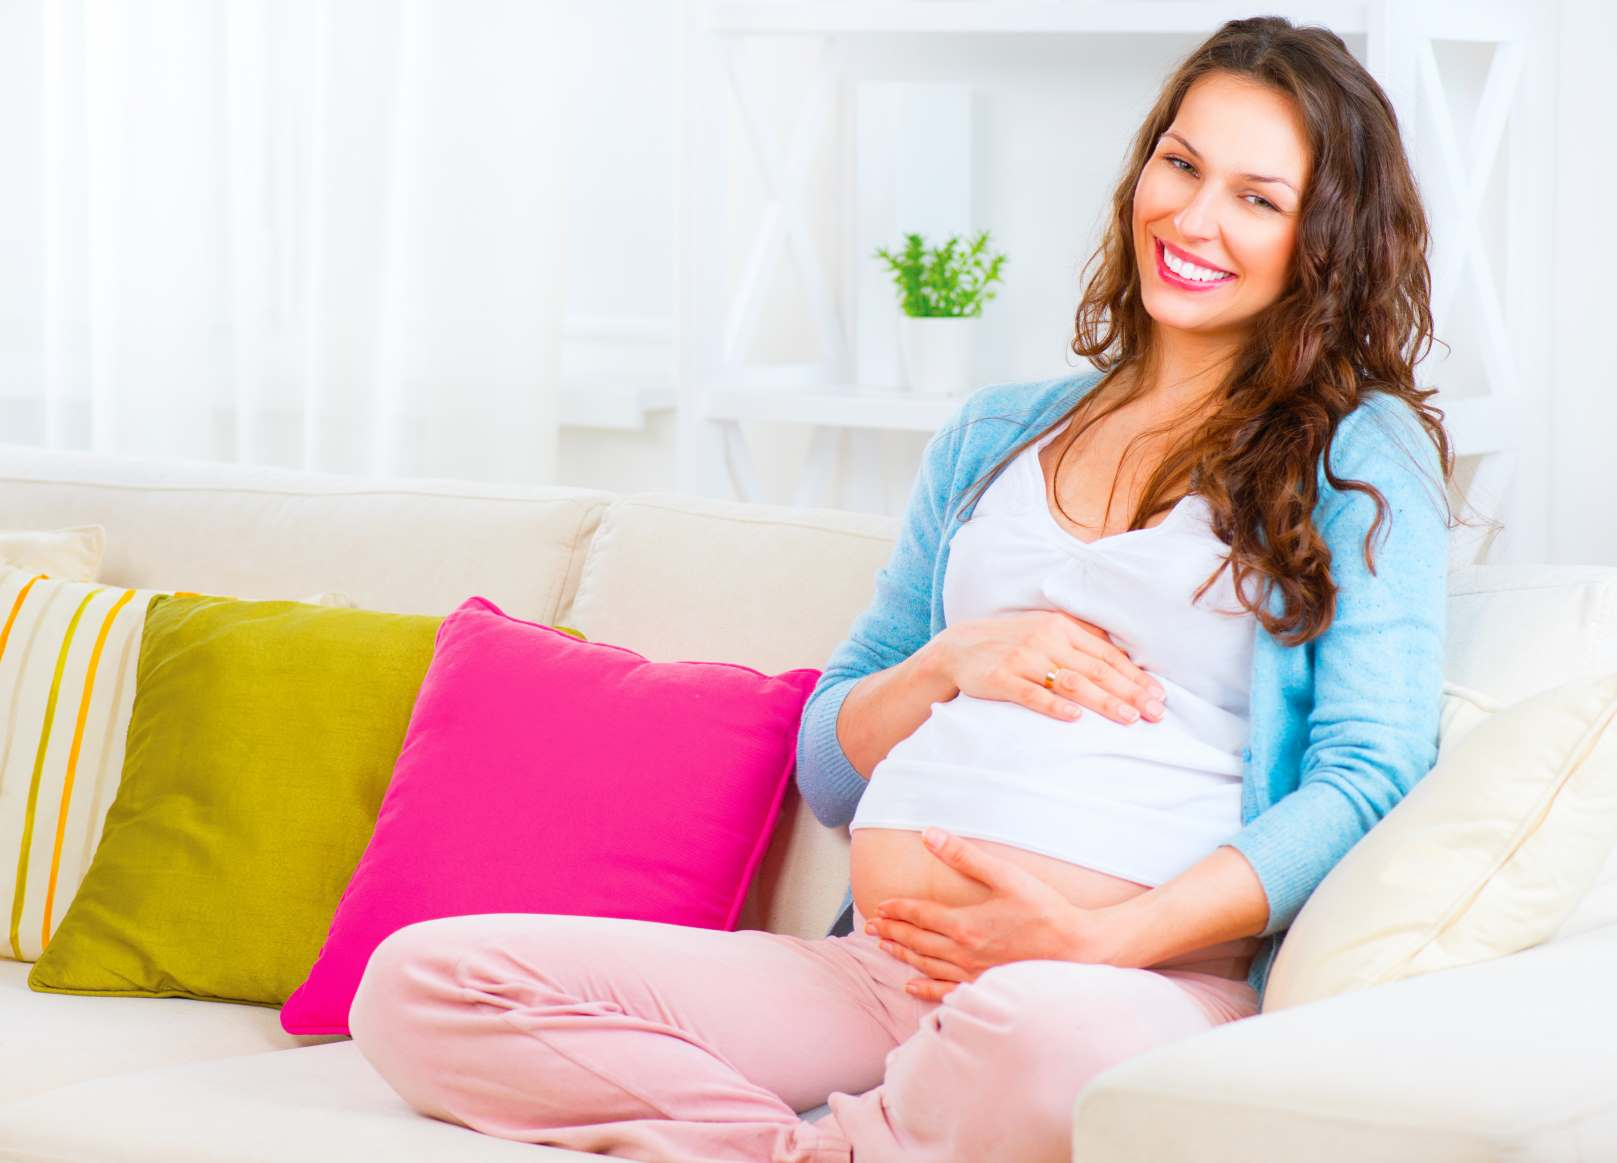 Decare dental - dental care while pregnant